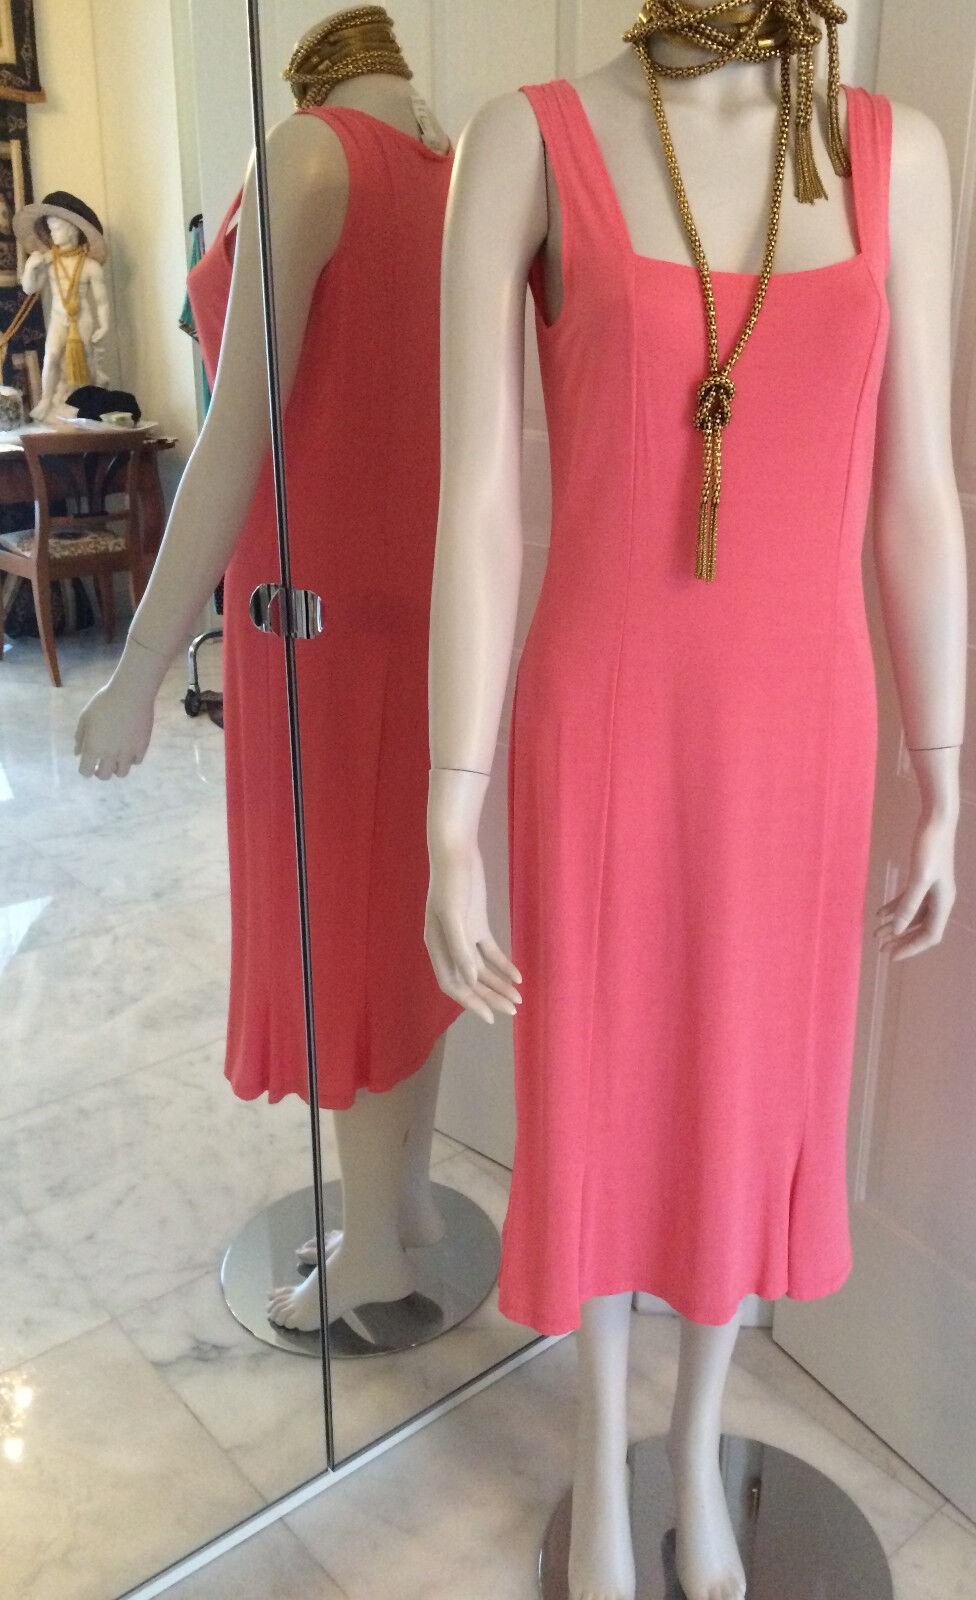 GABRIELLA FRATTINI,600 EURO,LUXUS,COUTURE,Designer Kleid,Urlaub,,M L L XL